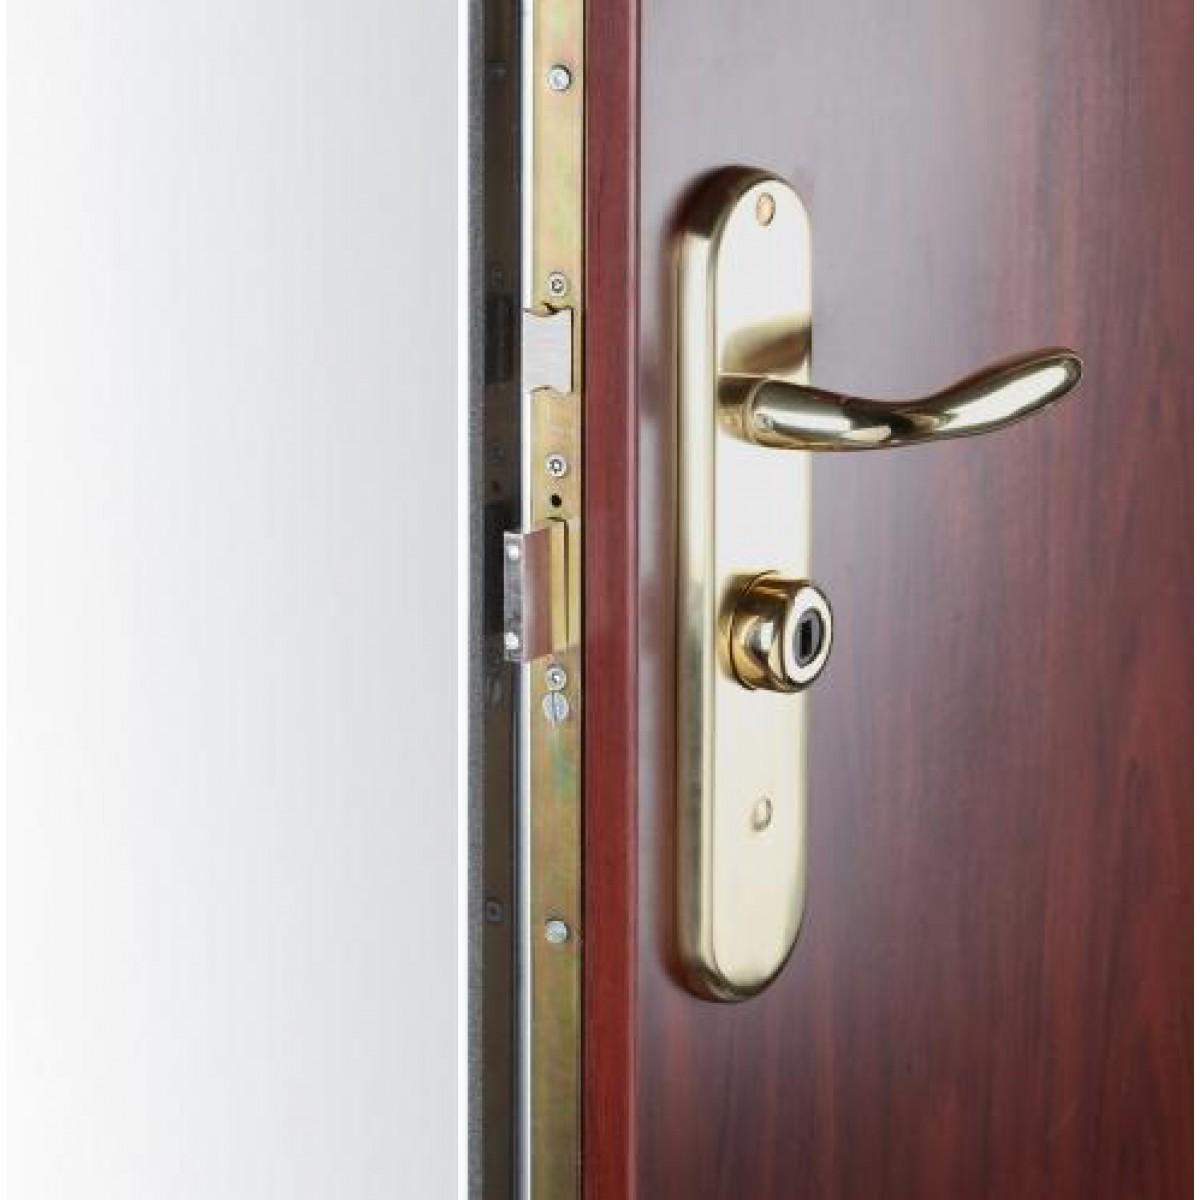 Porte d 39 entr e blind e protecdoor for Porte d entree d appartement